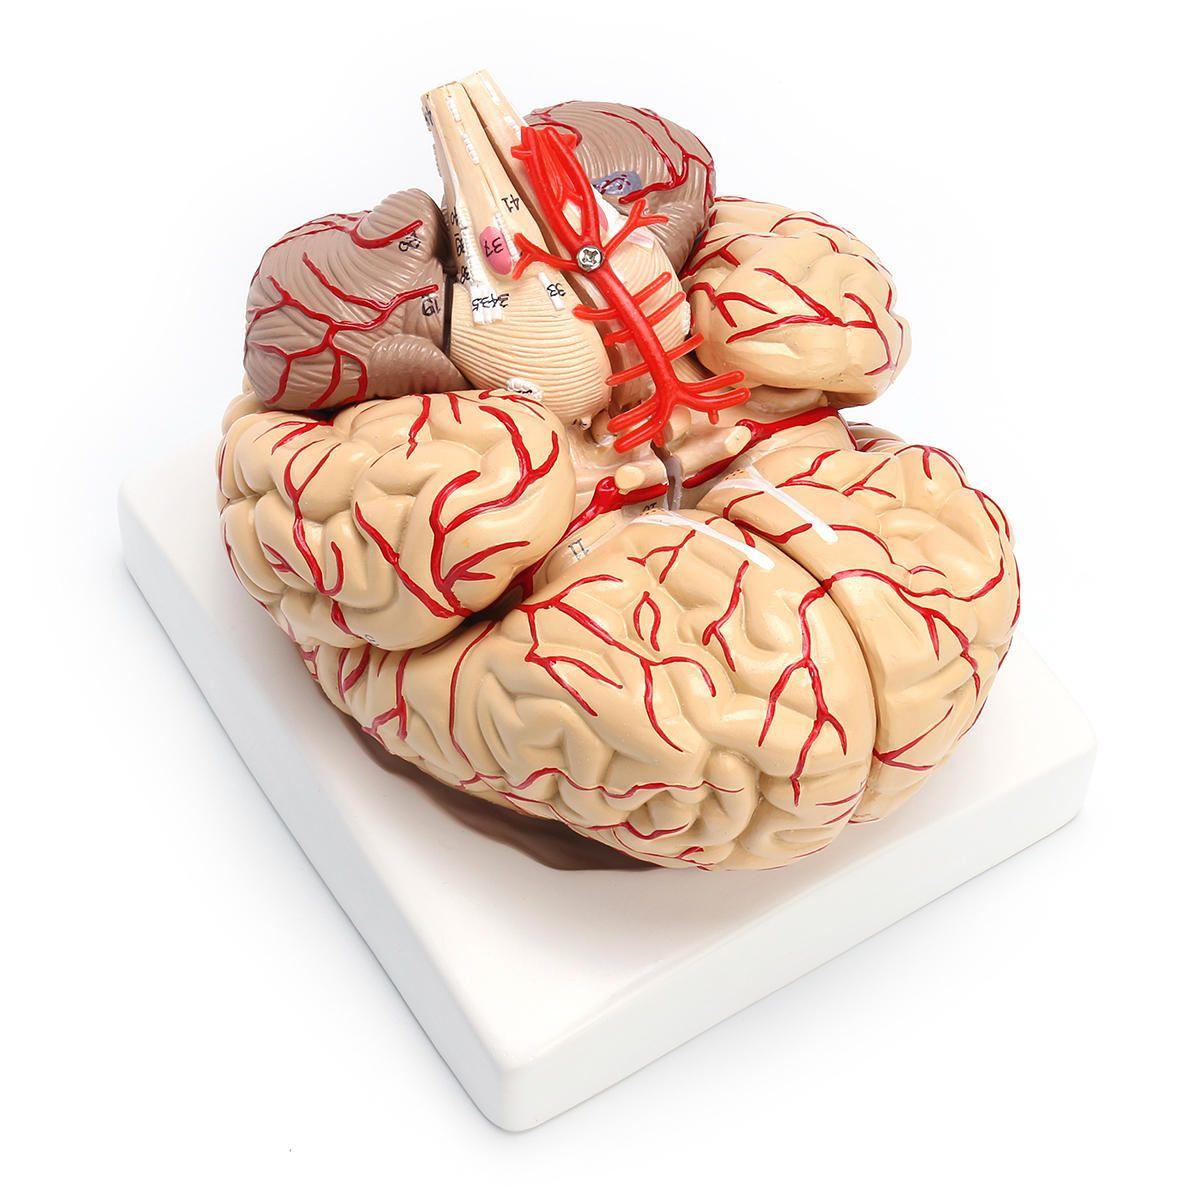 Us 49 99 1 1 Life Size Scientific Human Brain Arteries